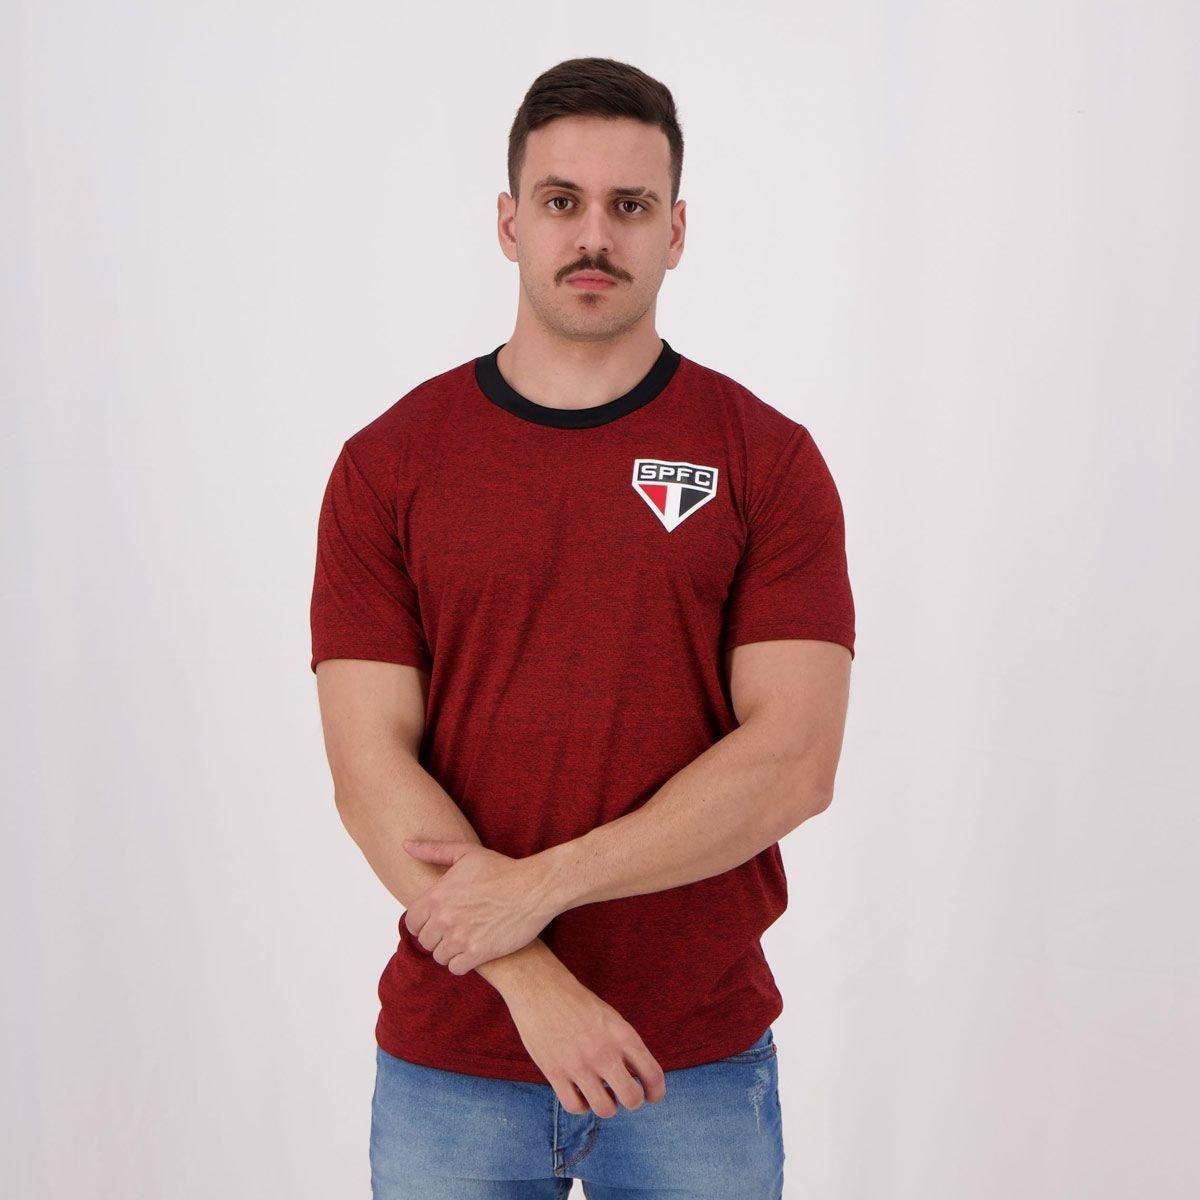 Camisa São Paulo Elyseo SPR - Masculino